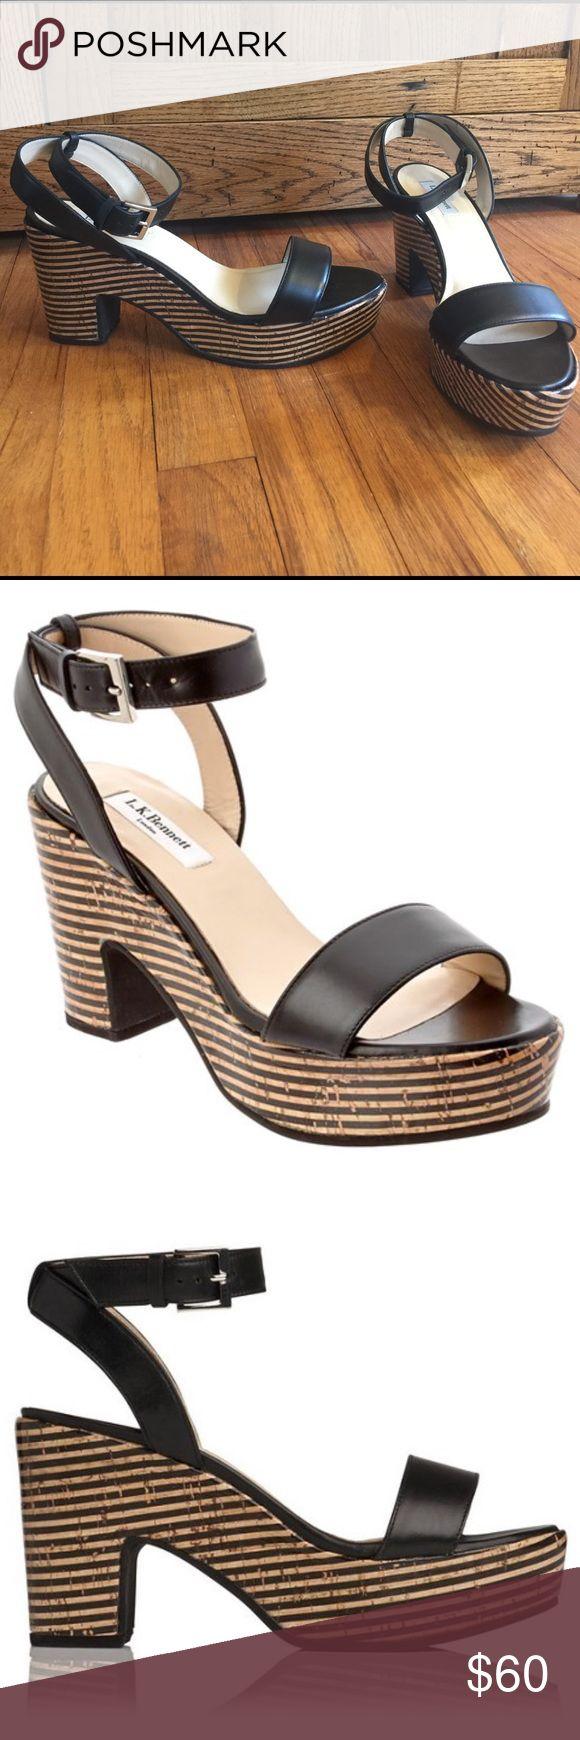 "1 DAY SALE! LK Bennett ""Gillian"" sandals! Sz 42 Beautiful brand new LK Bennett Gillian sandals! Sz 42 LK Bennett Shoes"